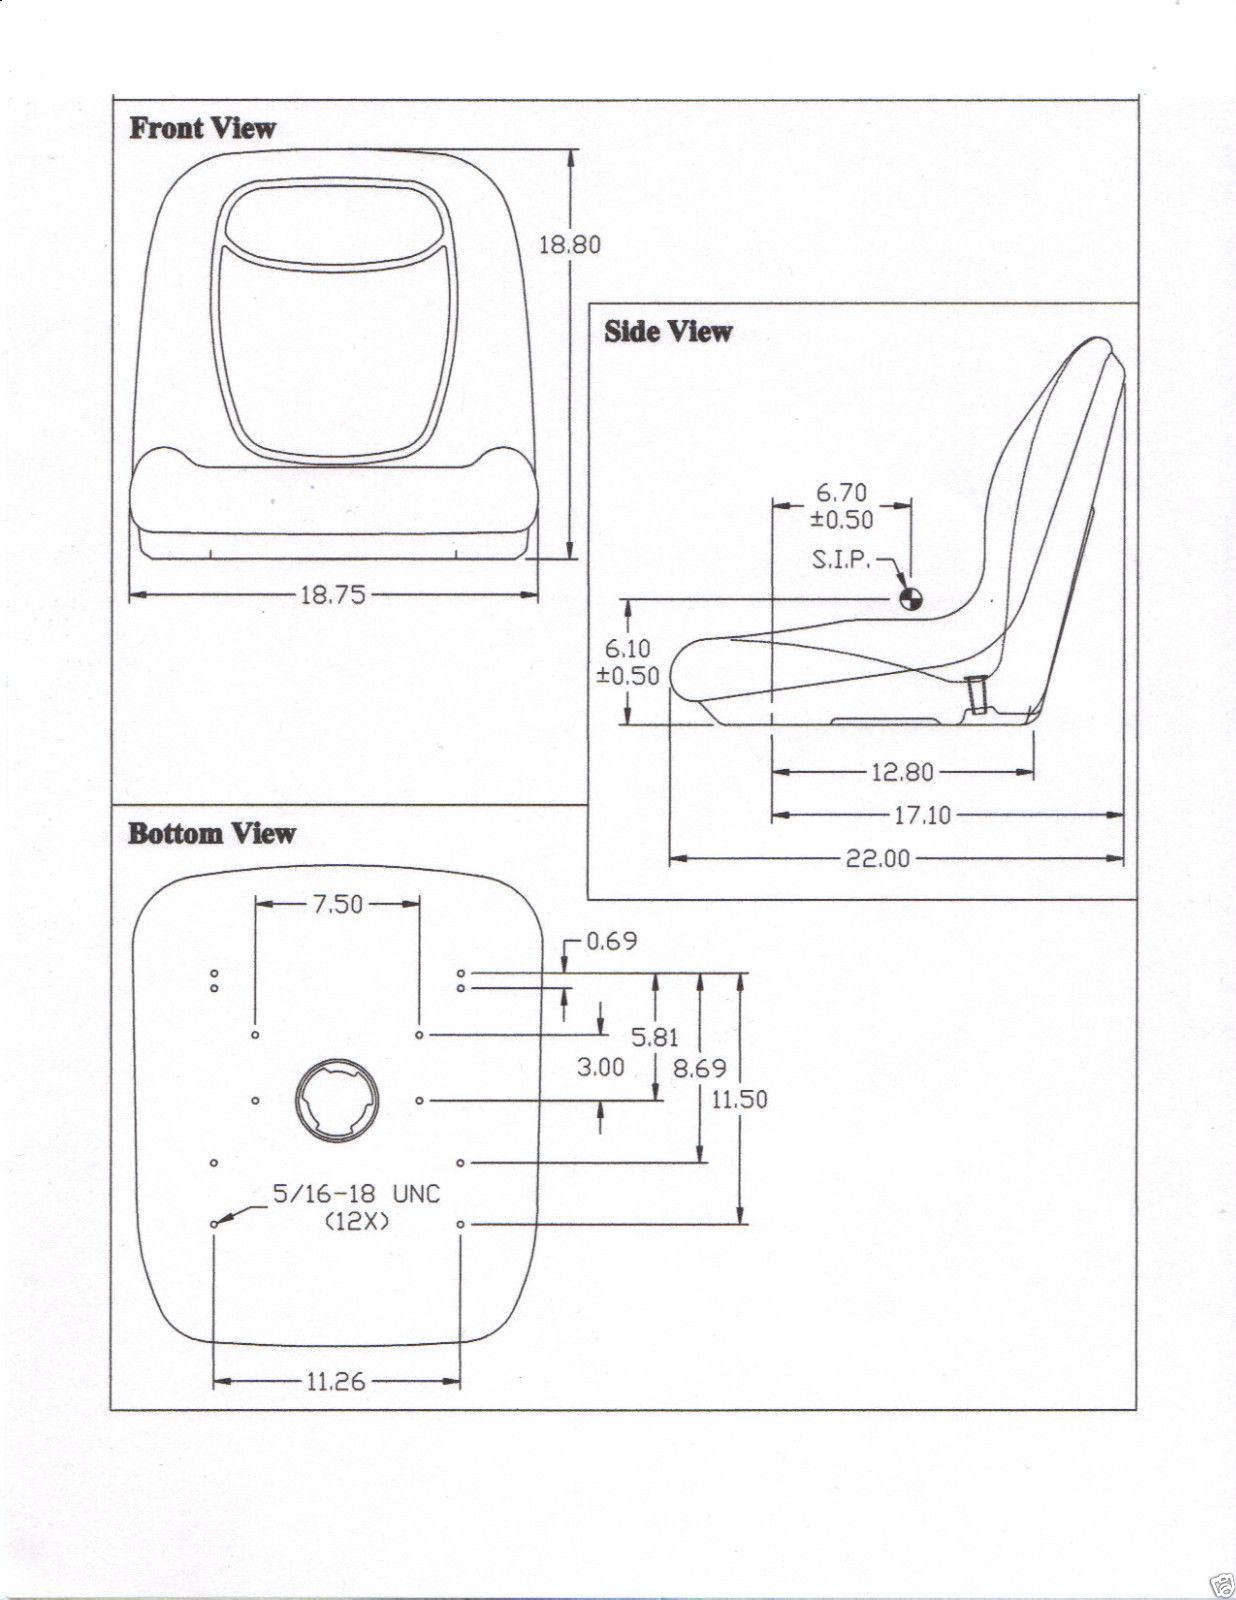 YELLOW SEAT FOR JOHN DEERE ZERO TURN MOWER Z TRAK M653M655M665717A727A BI 151699570196 7 yellow seat for john deere zero turn mower z trak, m653, m655 john deere 737 wiring diagram at nearapp.co